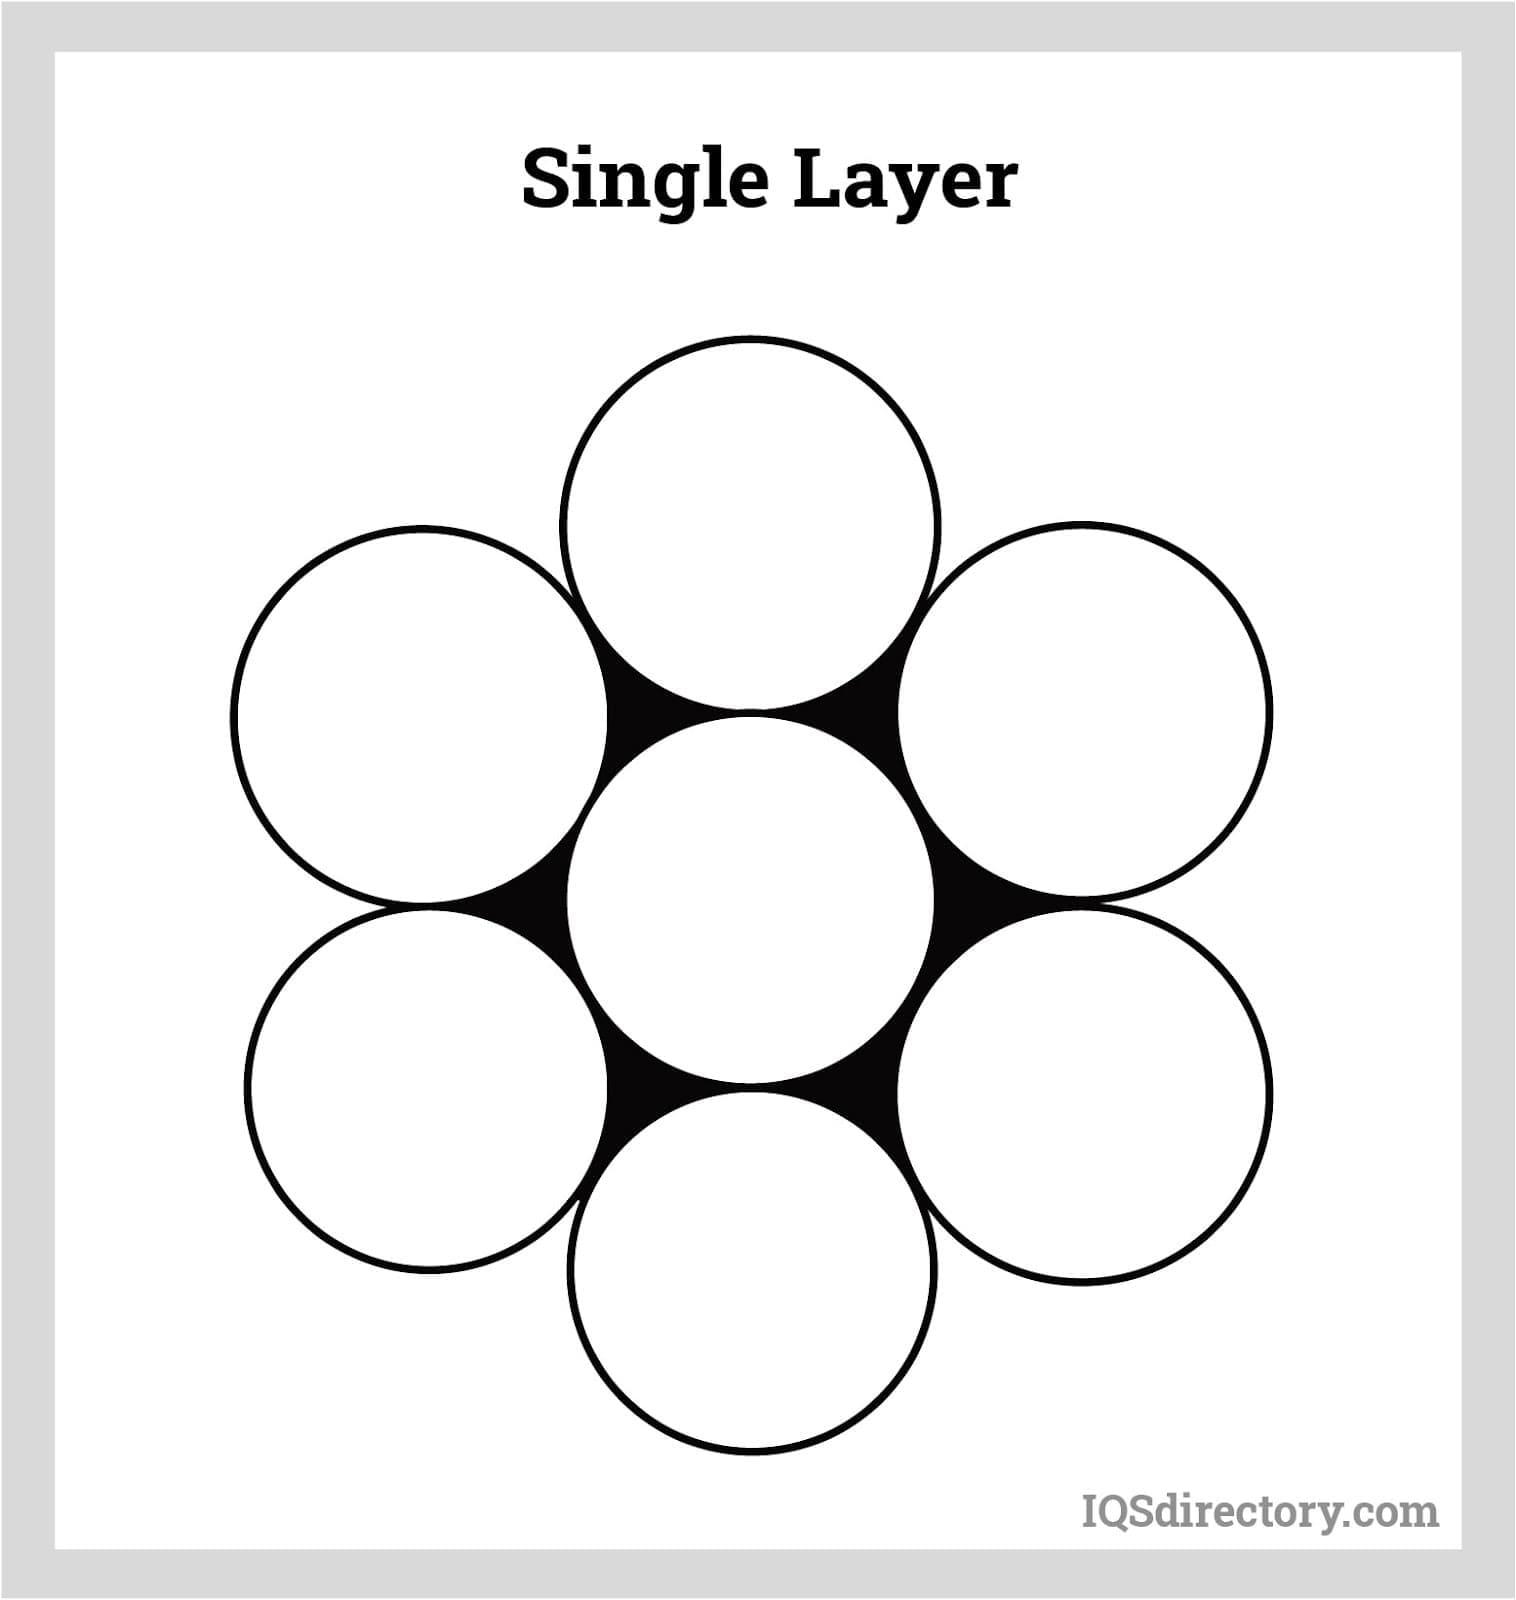 Single Layer